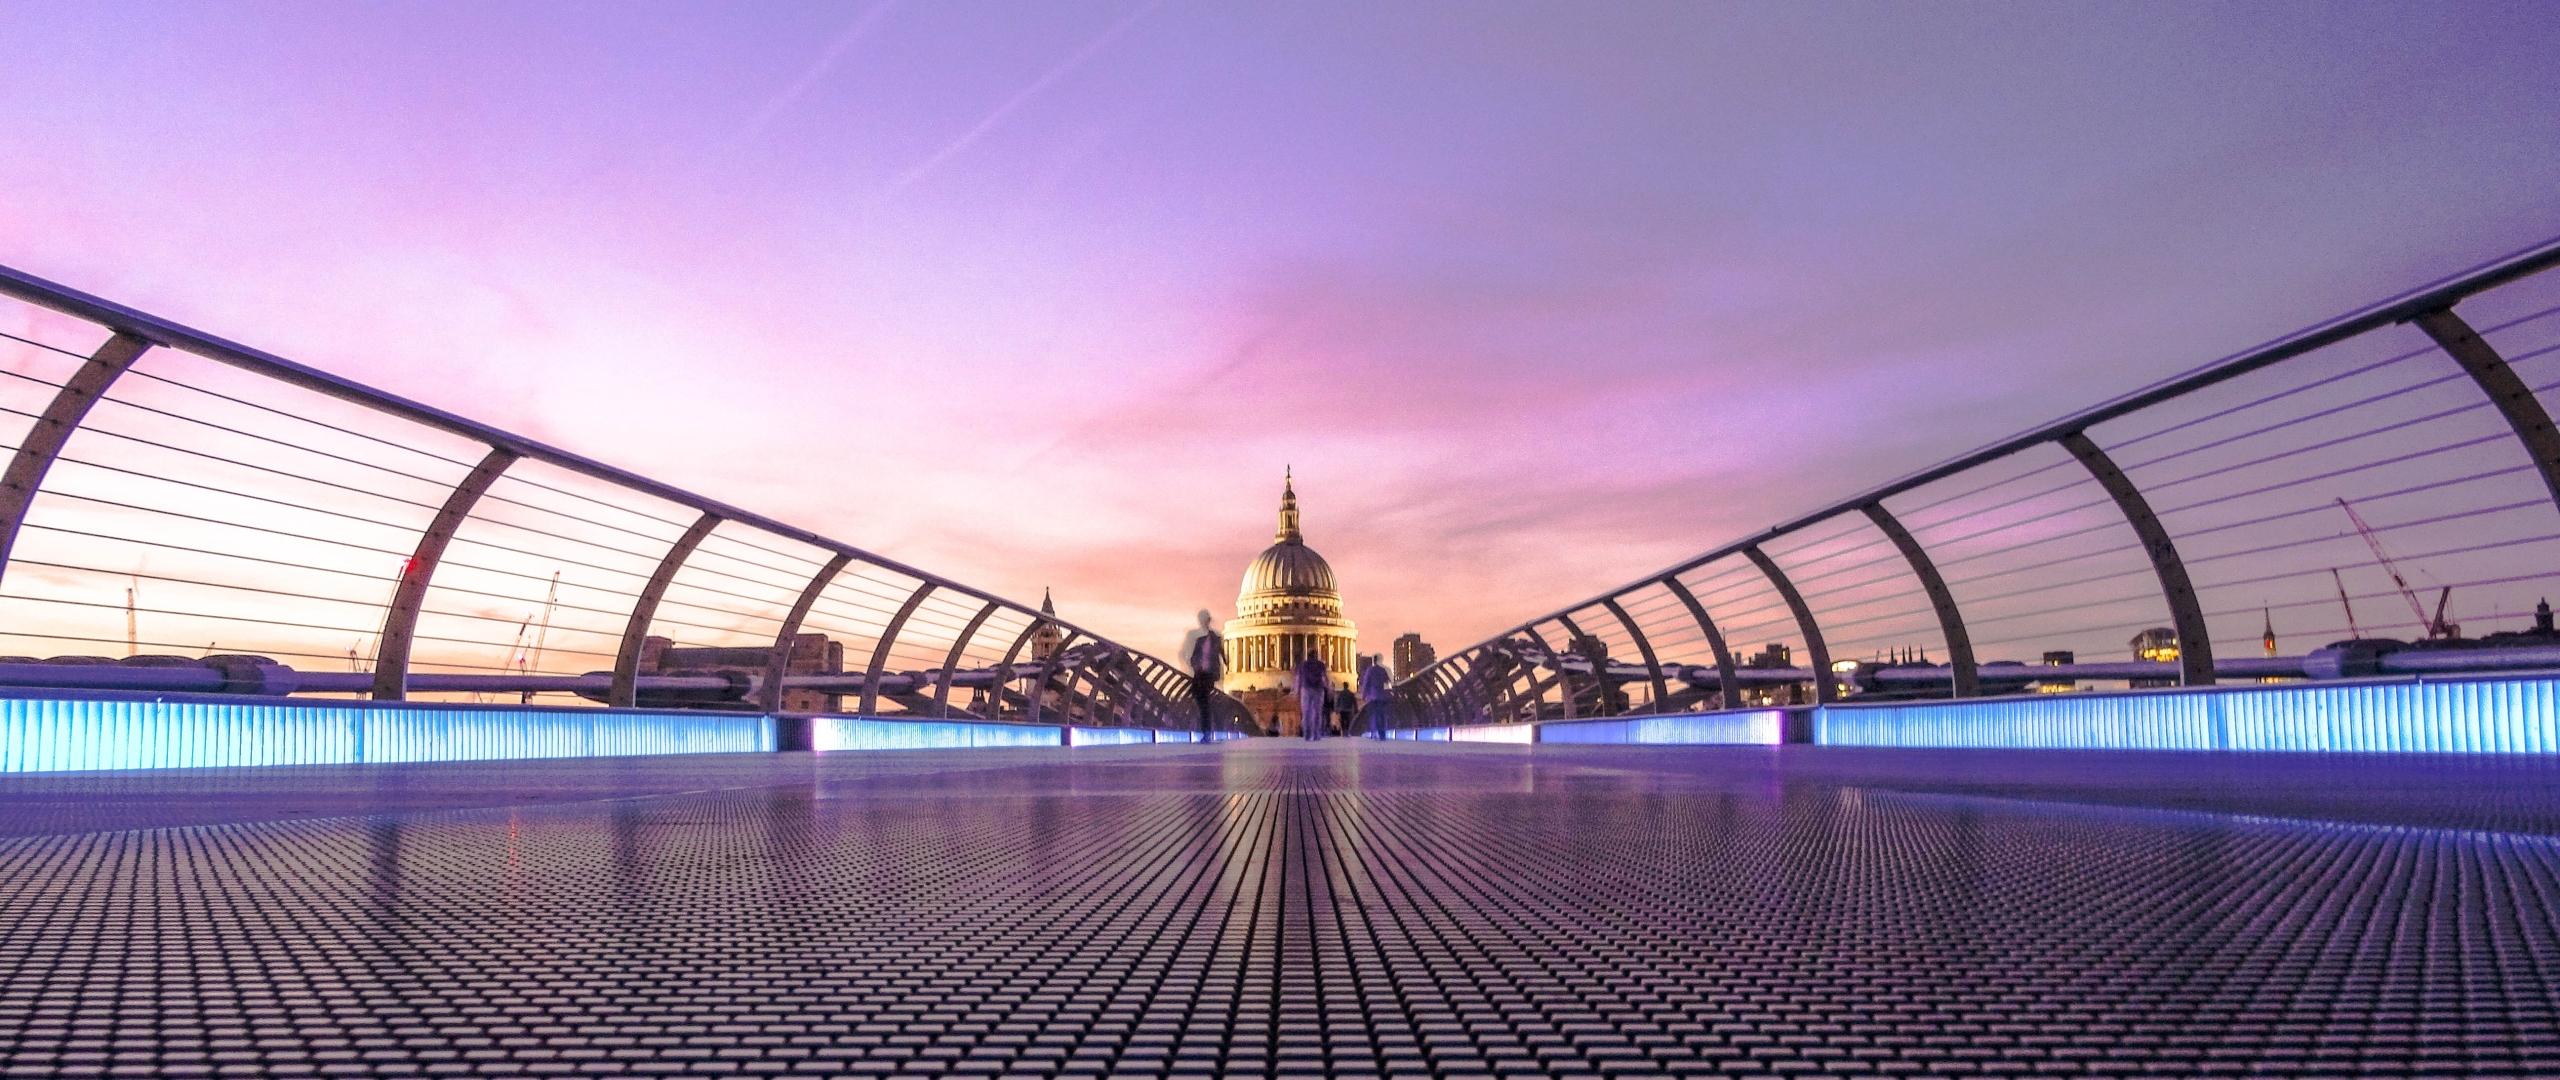 download millennium bridge london 7680x4320 resolution hd